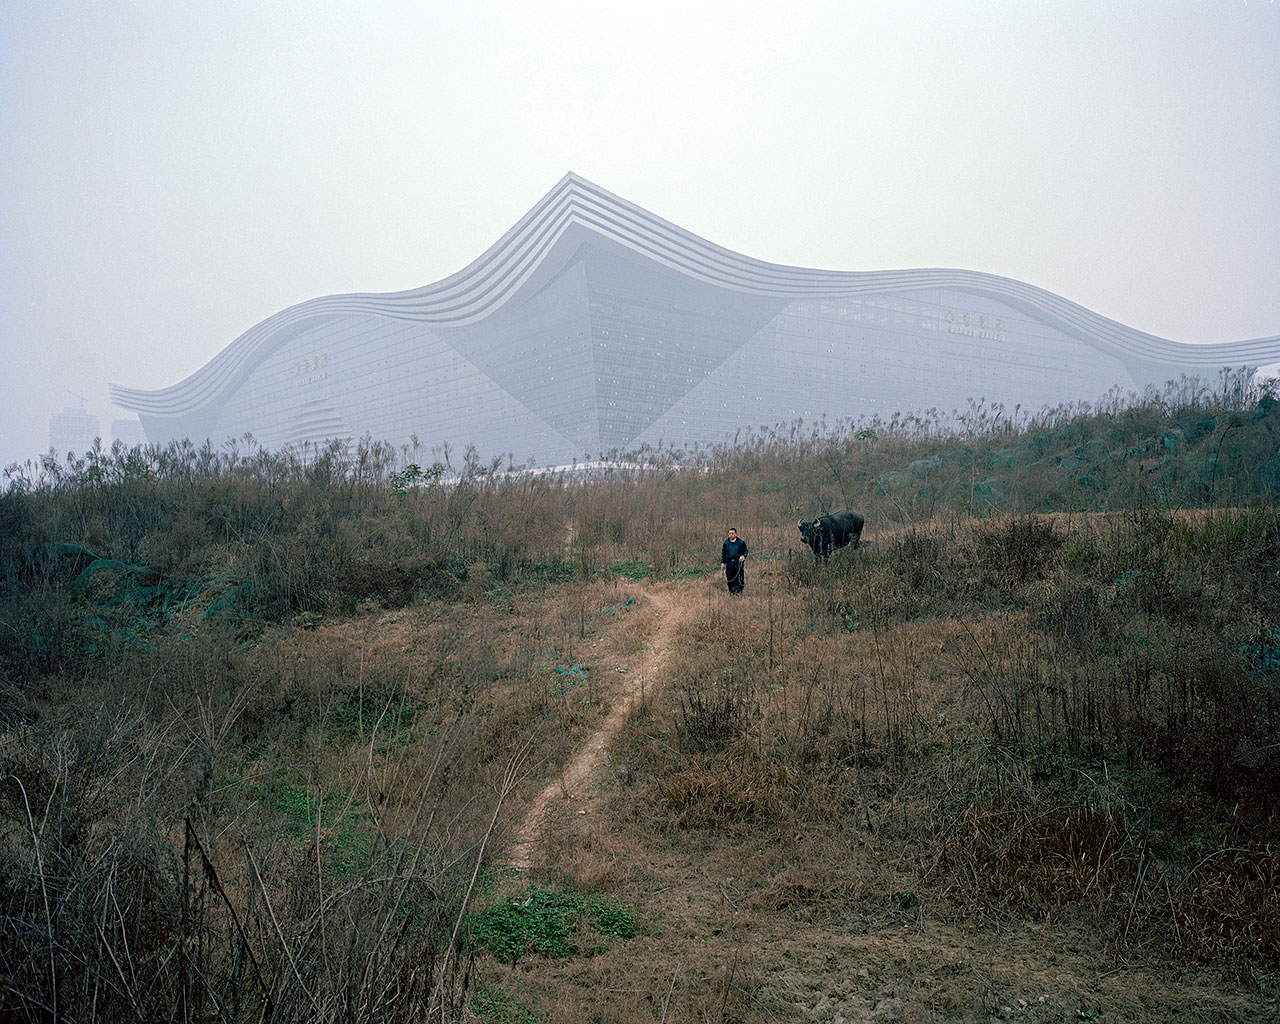 Julien Chatelin - China West - Felix Schoeller Photoaward